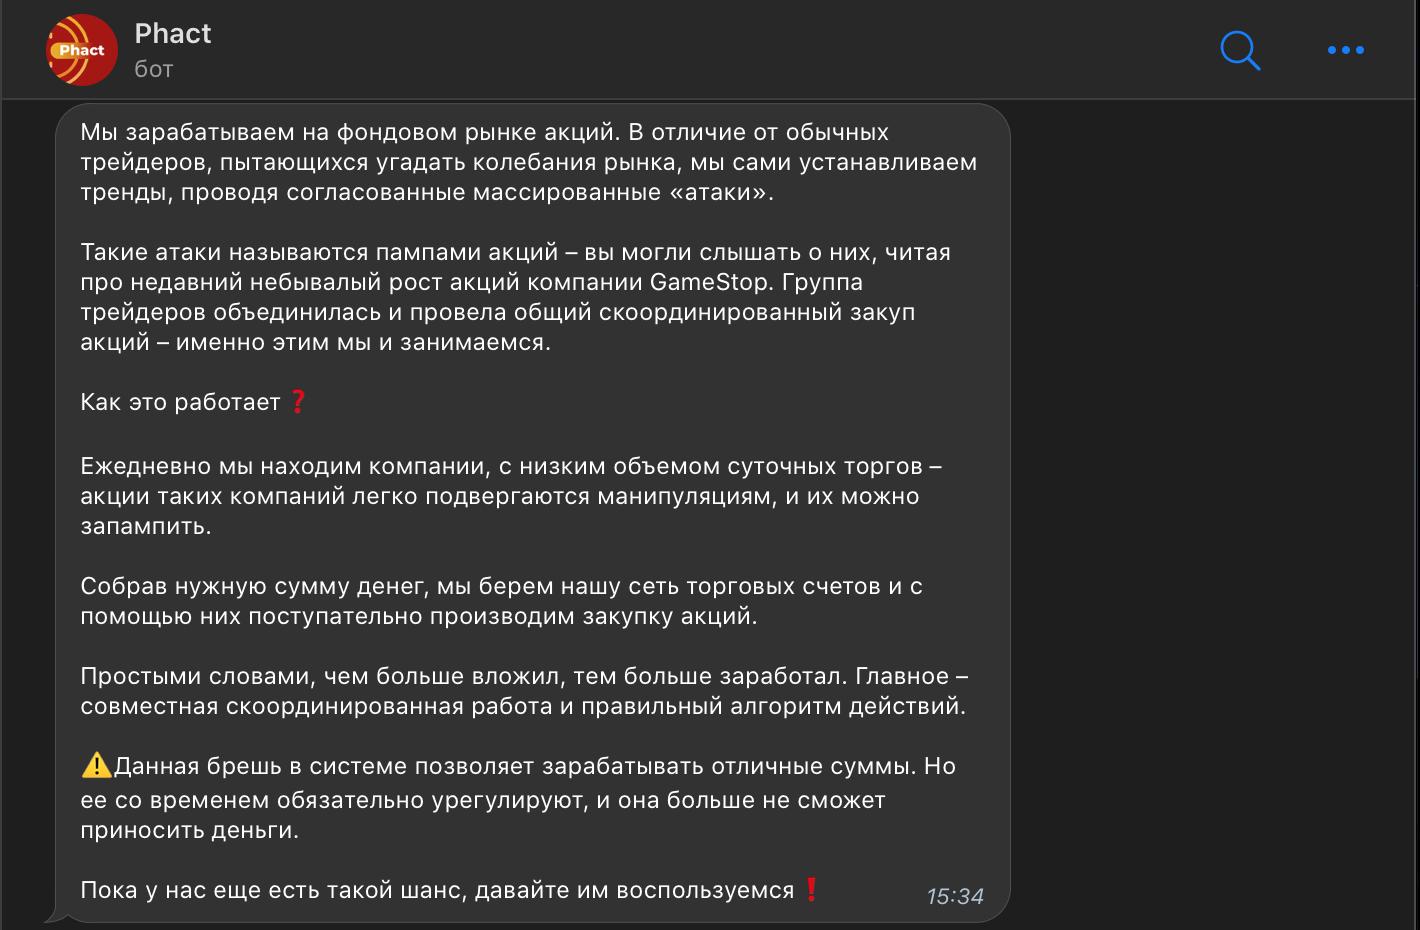 Принцип работы телеграмм трейдера Факт бот